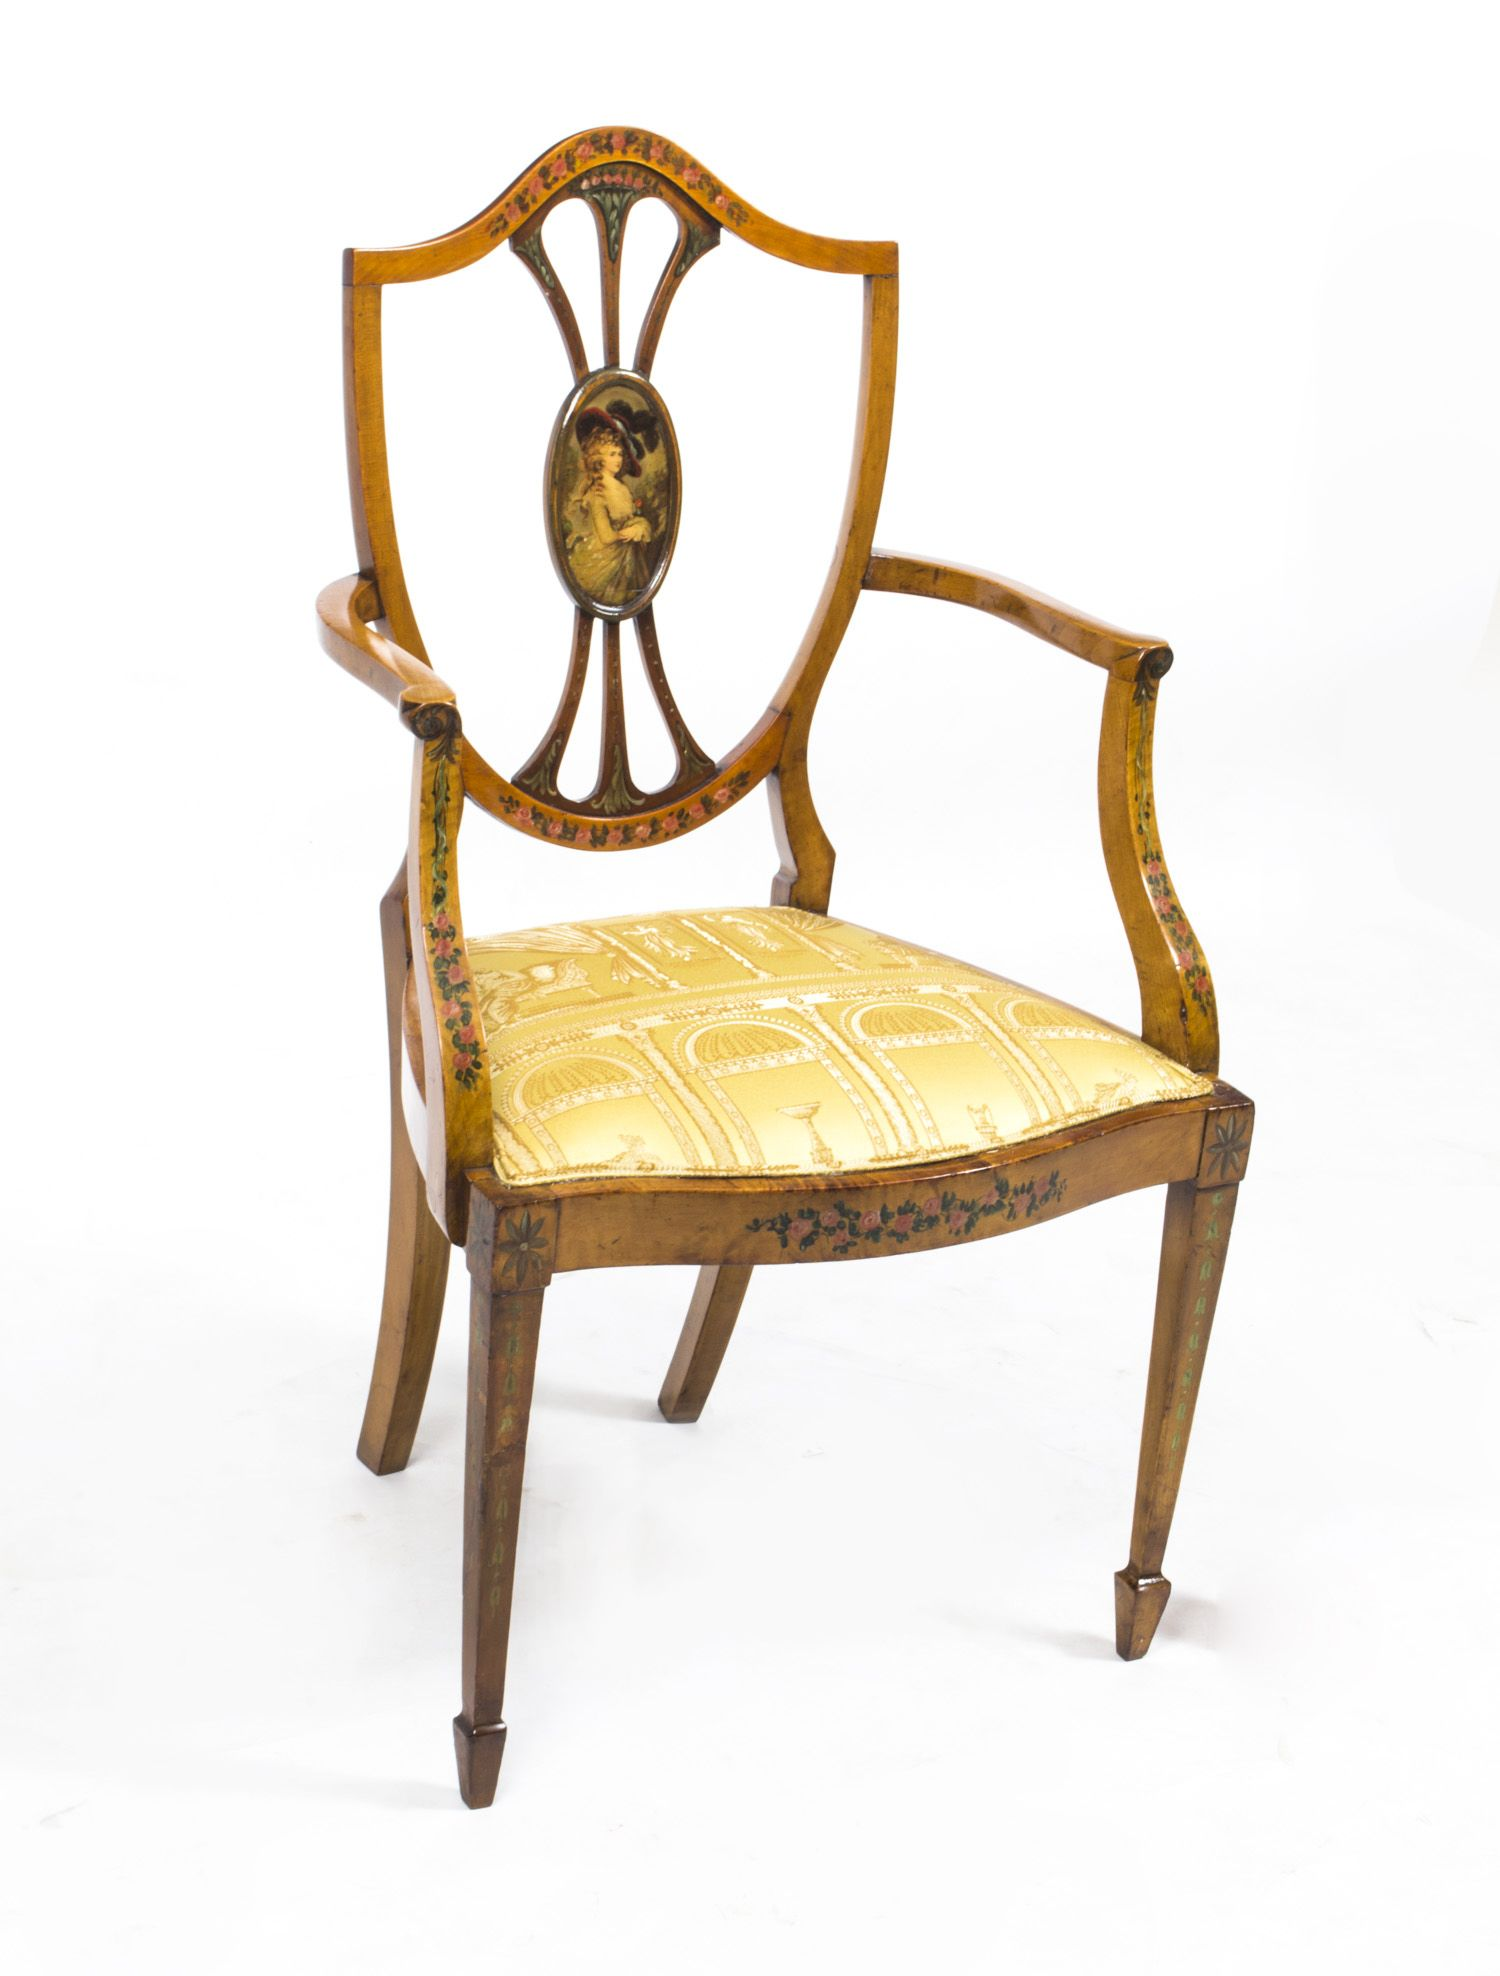 A beautiful antique Sheraton revival satinwood armchair circa 1900. - A Beautiful Antique Sheraton Revival Satinwood Armchair Circa 1900